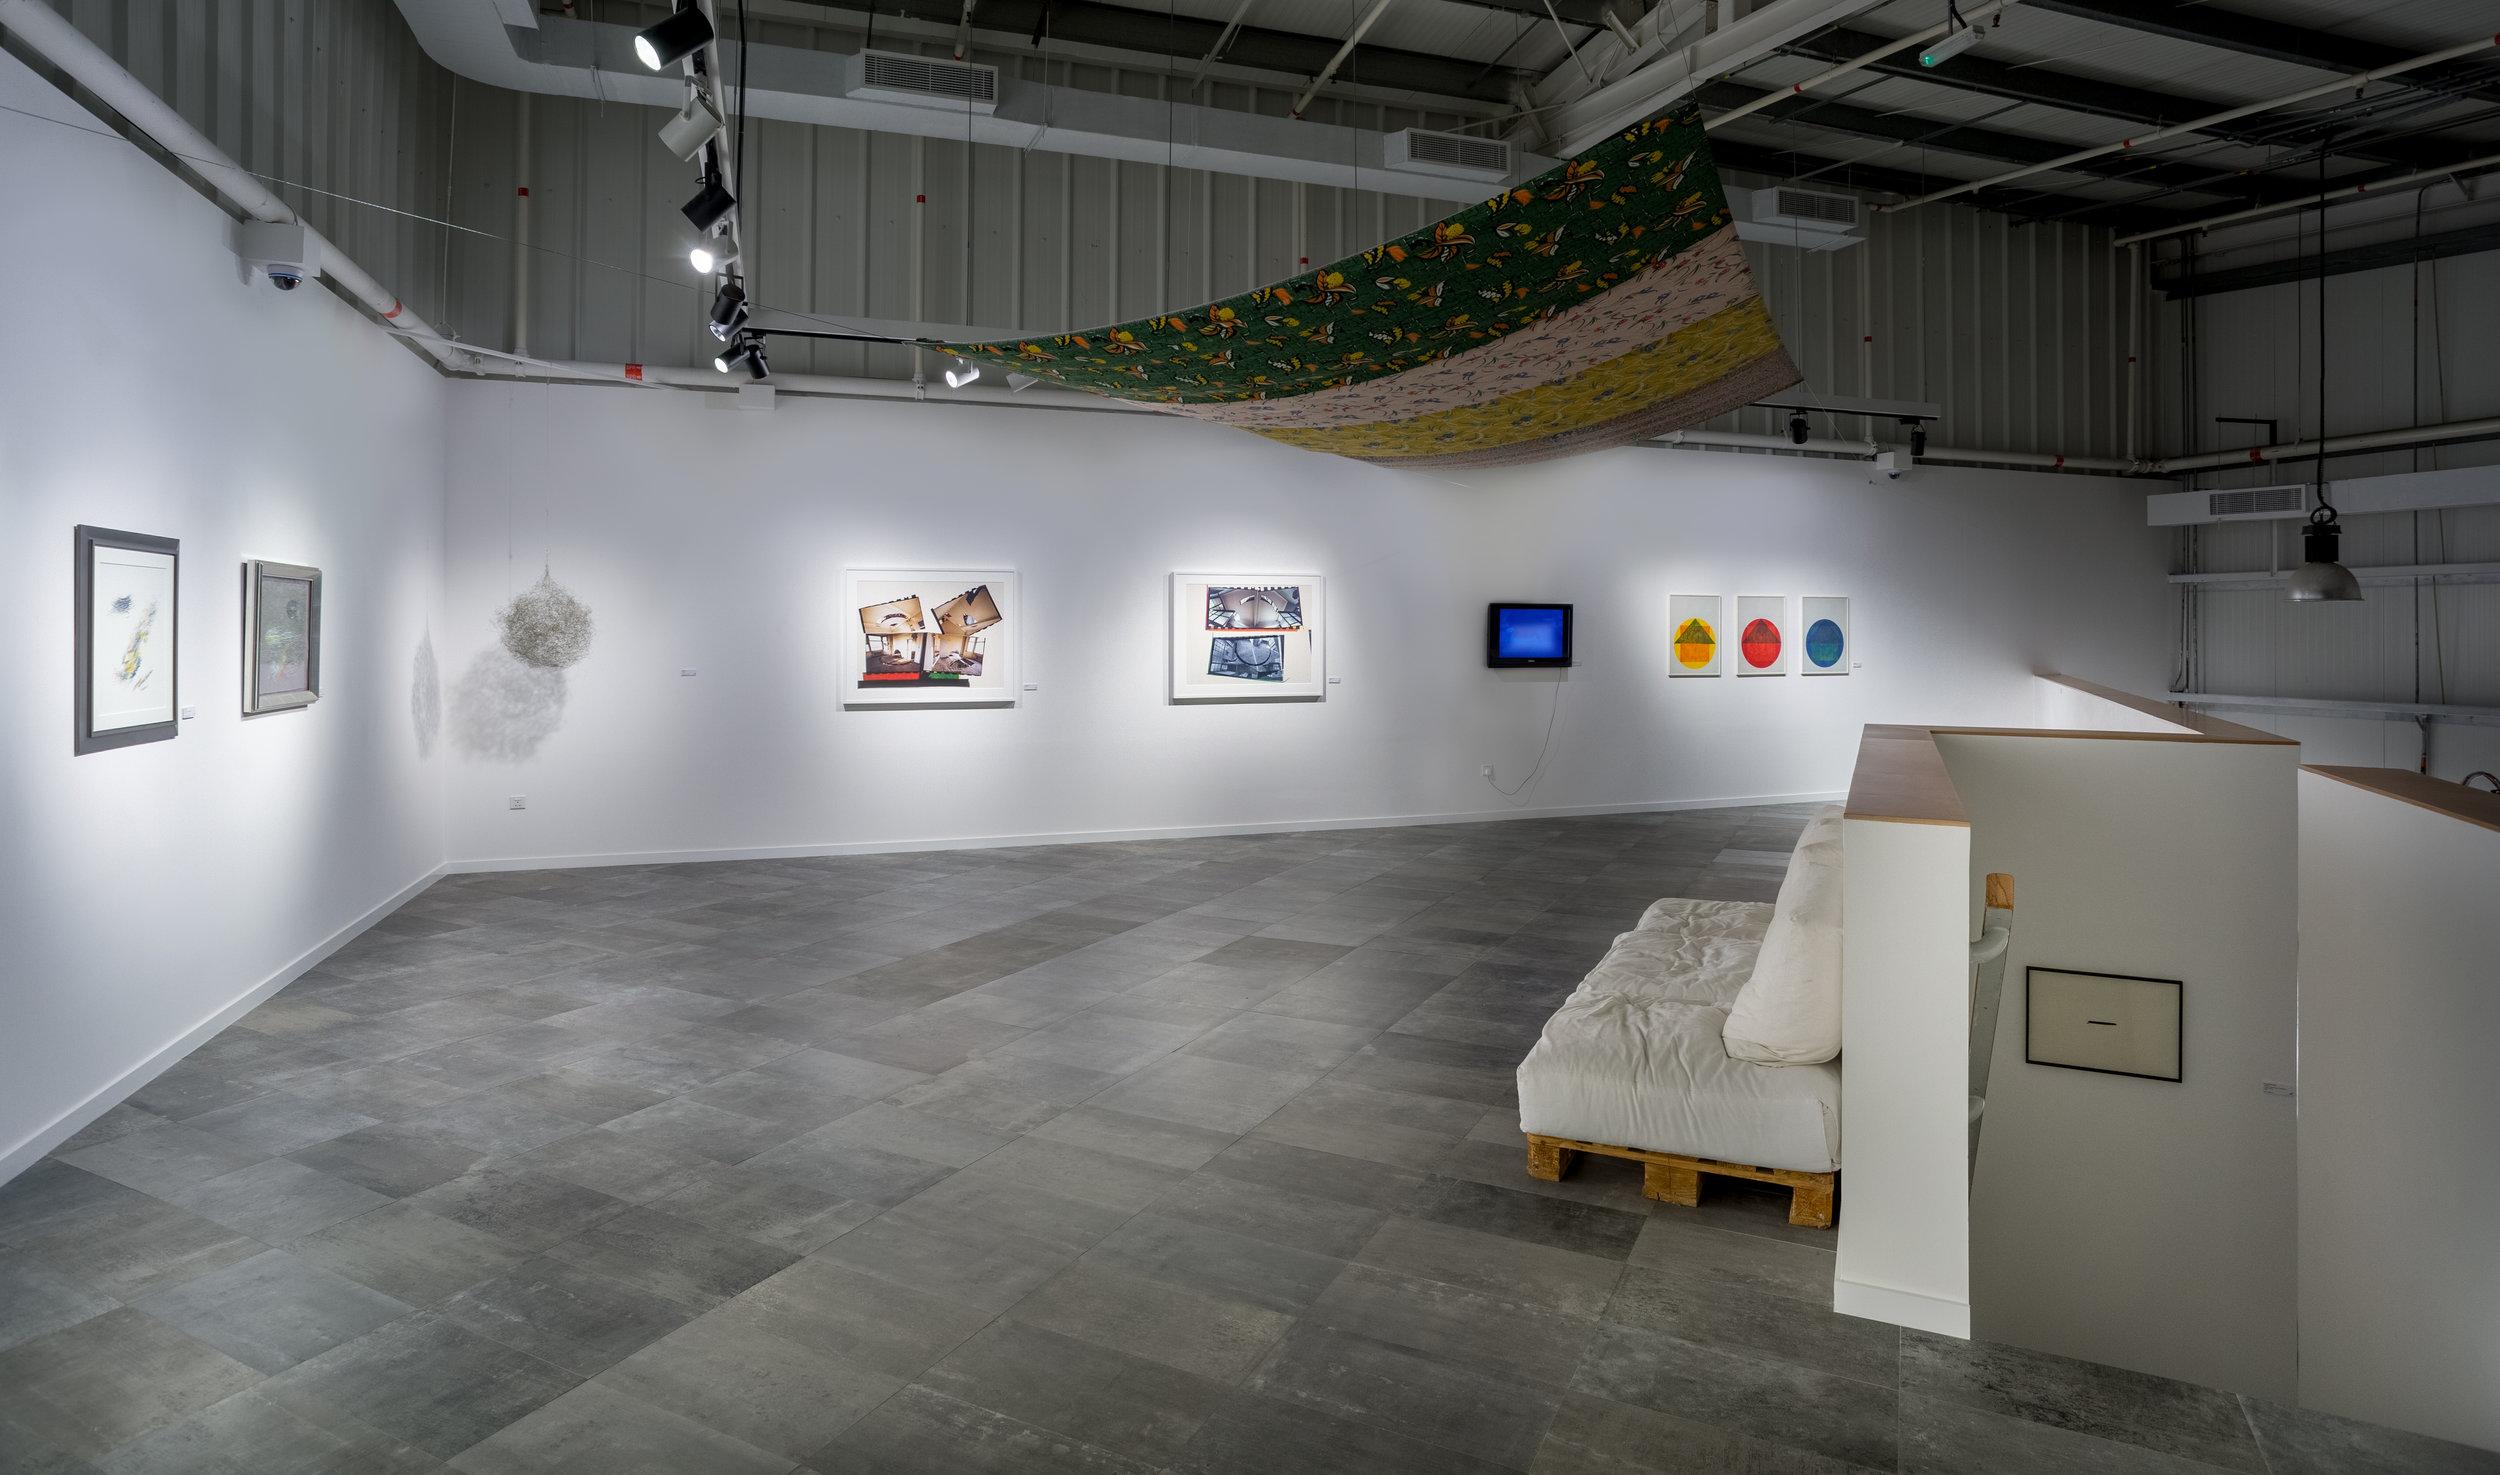 Artist Run New York: the Seventies, Installation Shot, March 2017, Copyright 2017, Jean-Paul Najar Foundation